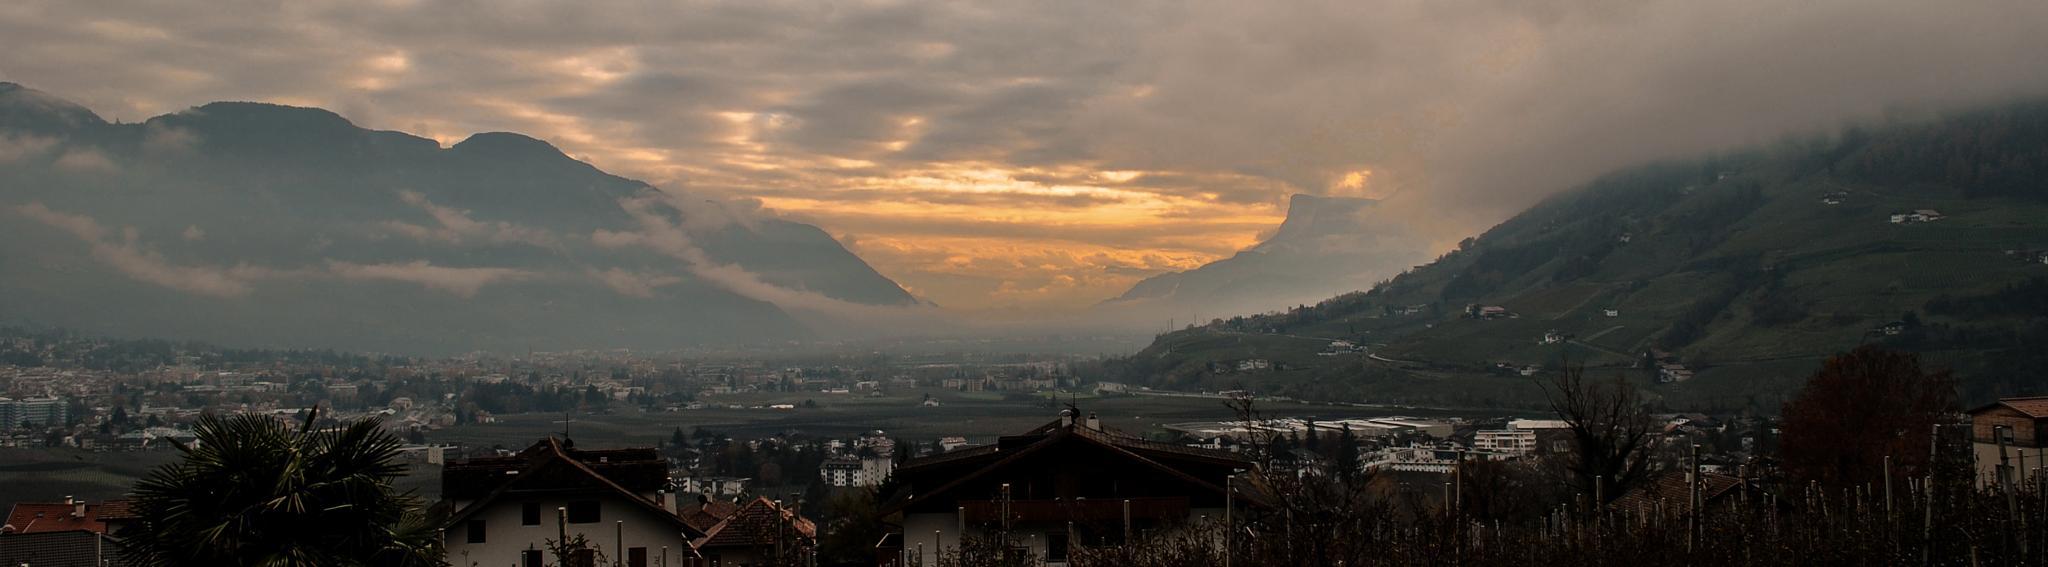 Tramonto in Trentino - Sunset in Trentino by Mauro Gigli